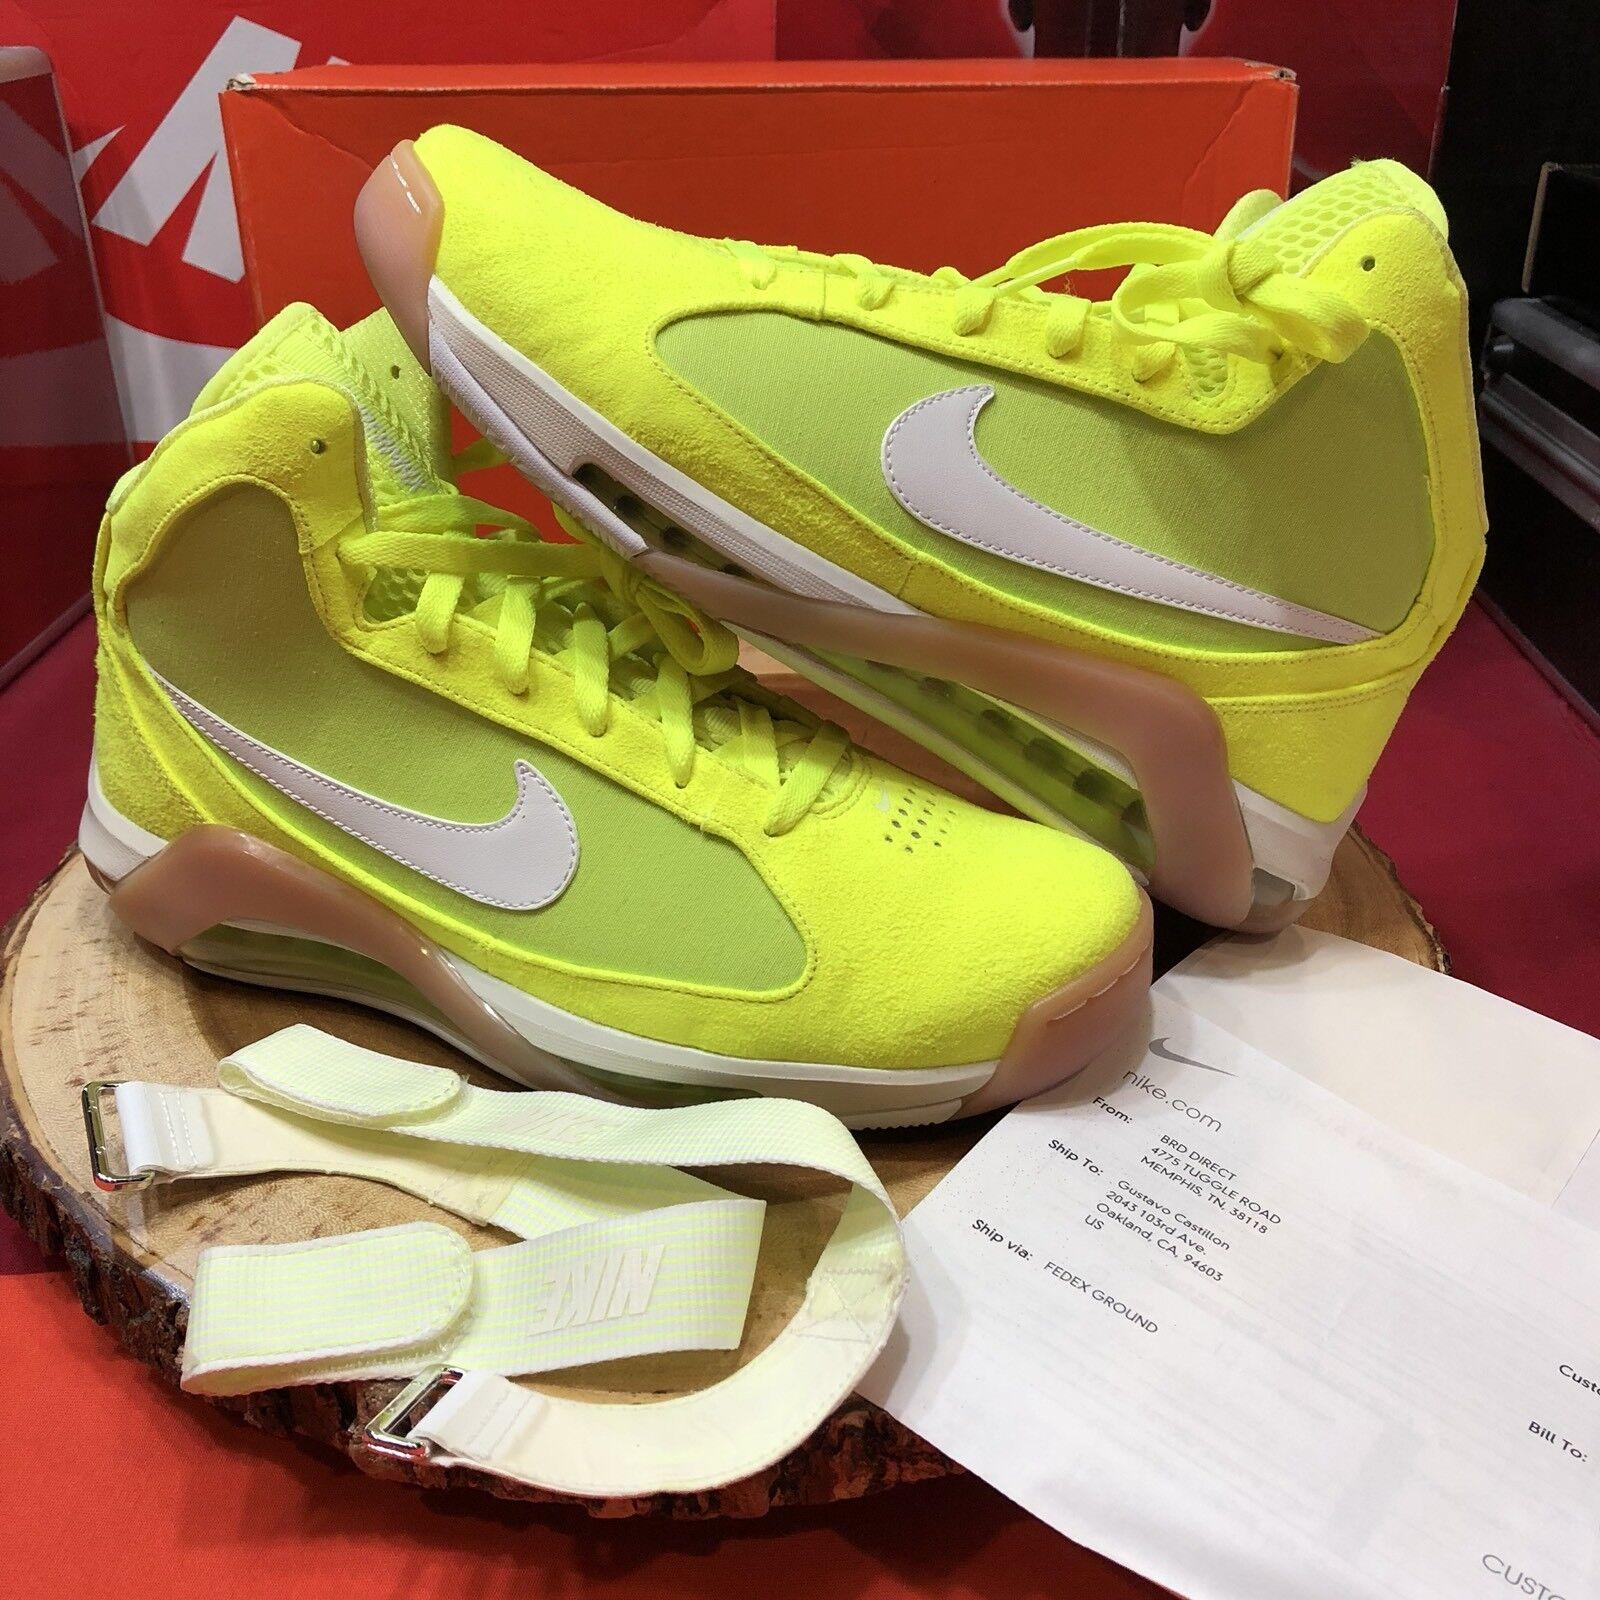 nike 711 air hypermax neuer tennisball gelb - 375946 711 nike größe 9,5 lebron jordan 419539